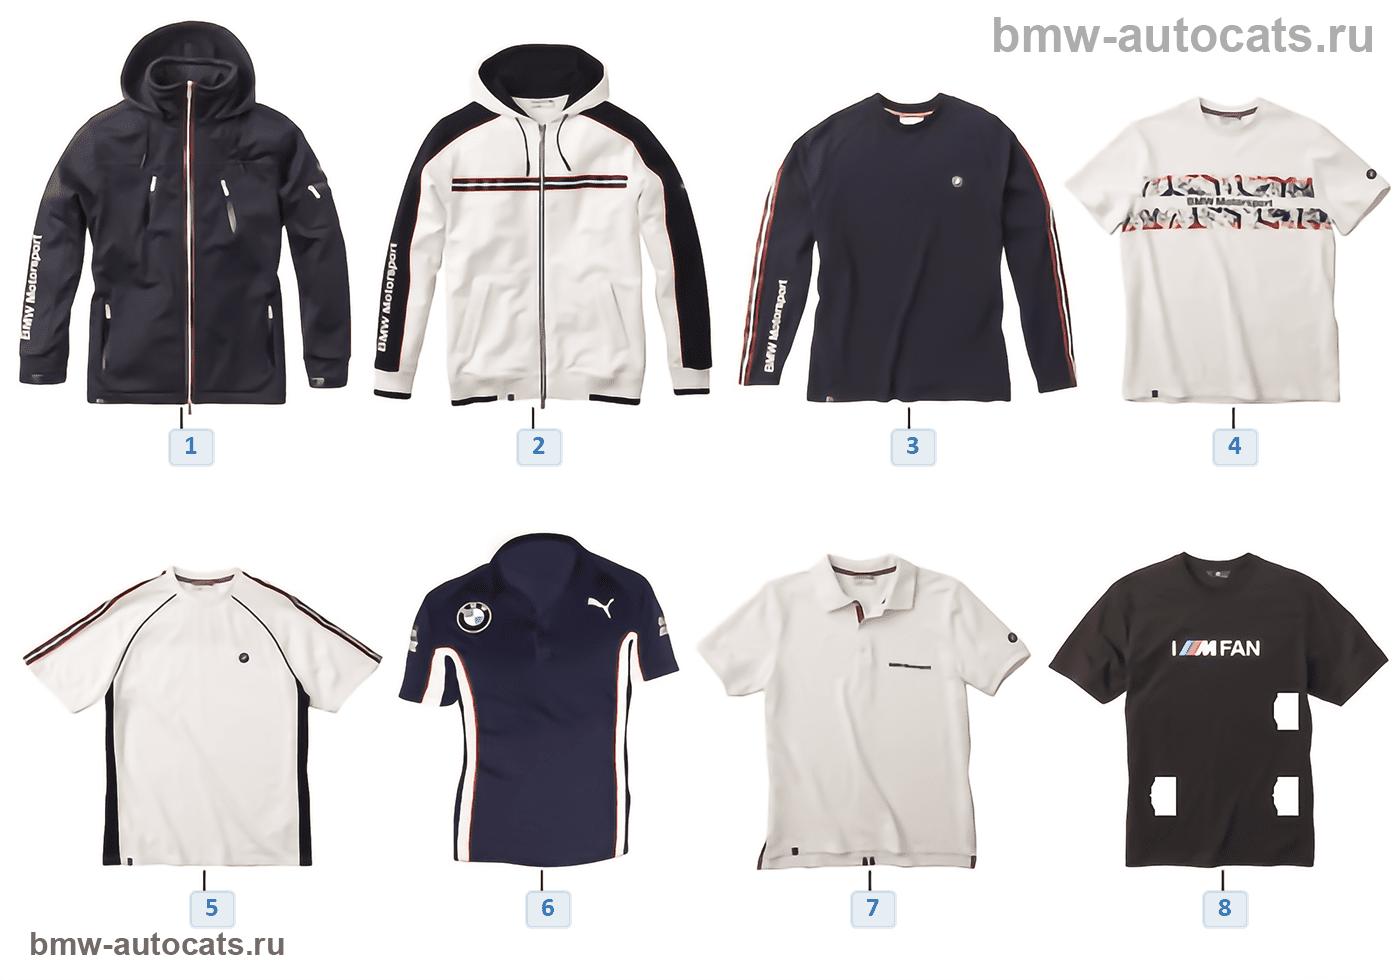 Motorsport — мужская одежда 2013/2014